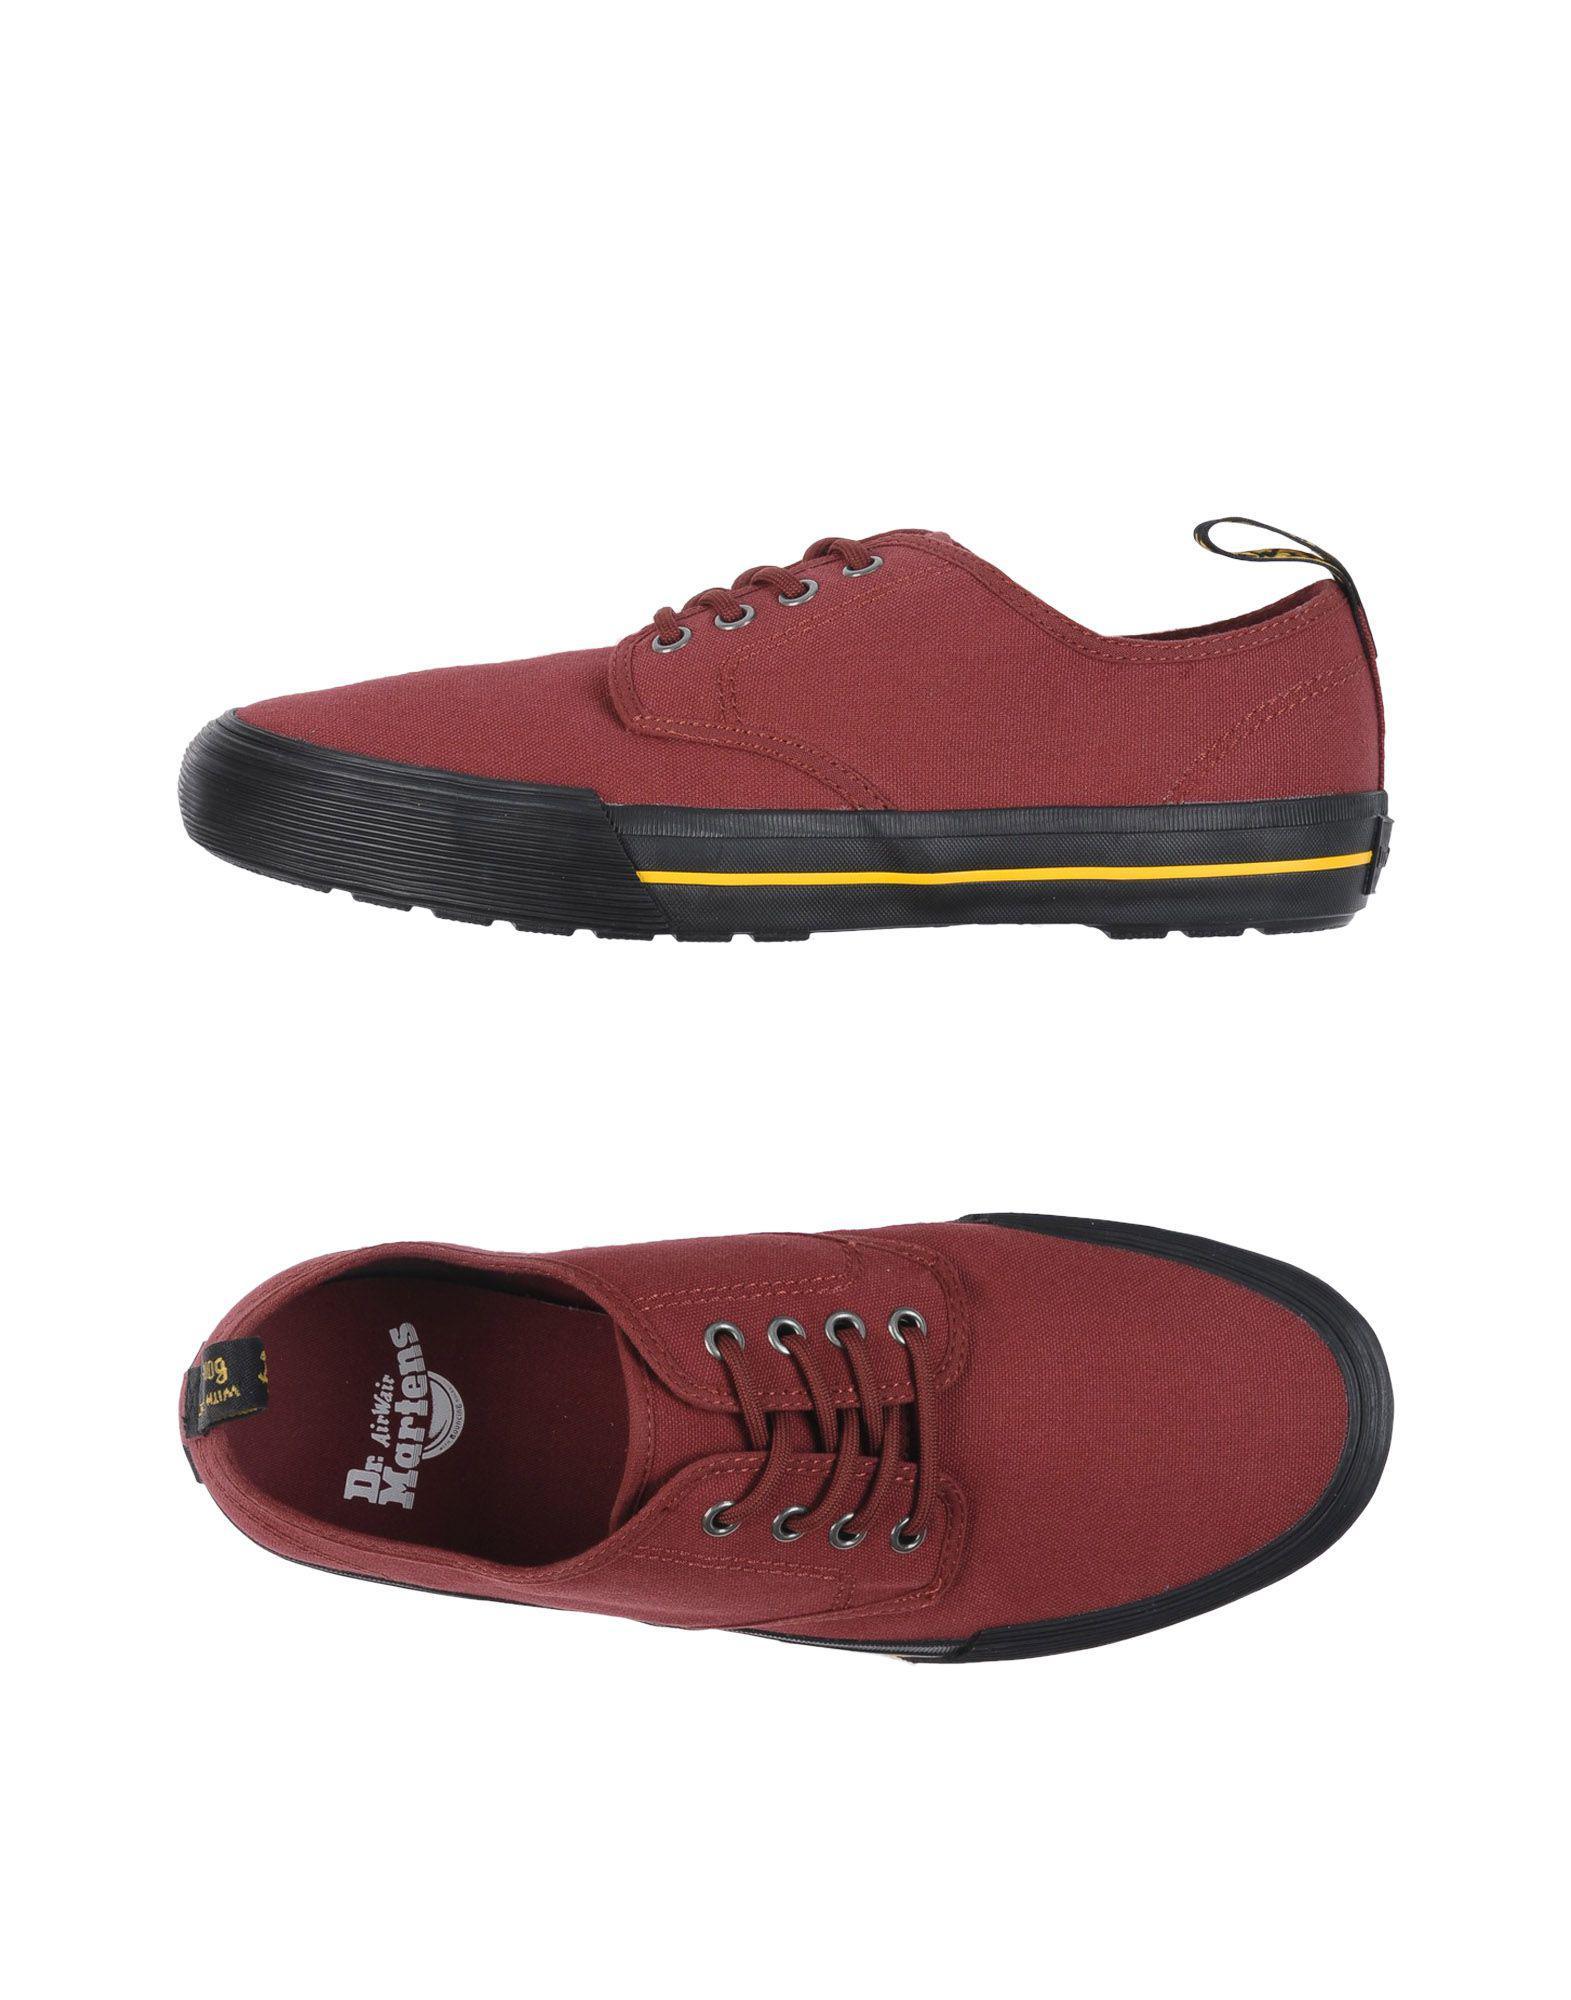 Dr. Dr. Martens Low-tops & Sneakers Martens Bas-tops Et Chaussures De Sport NNtu5Y